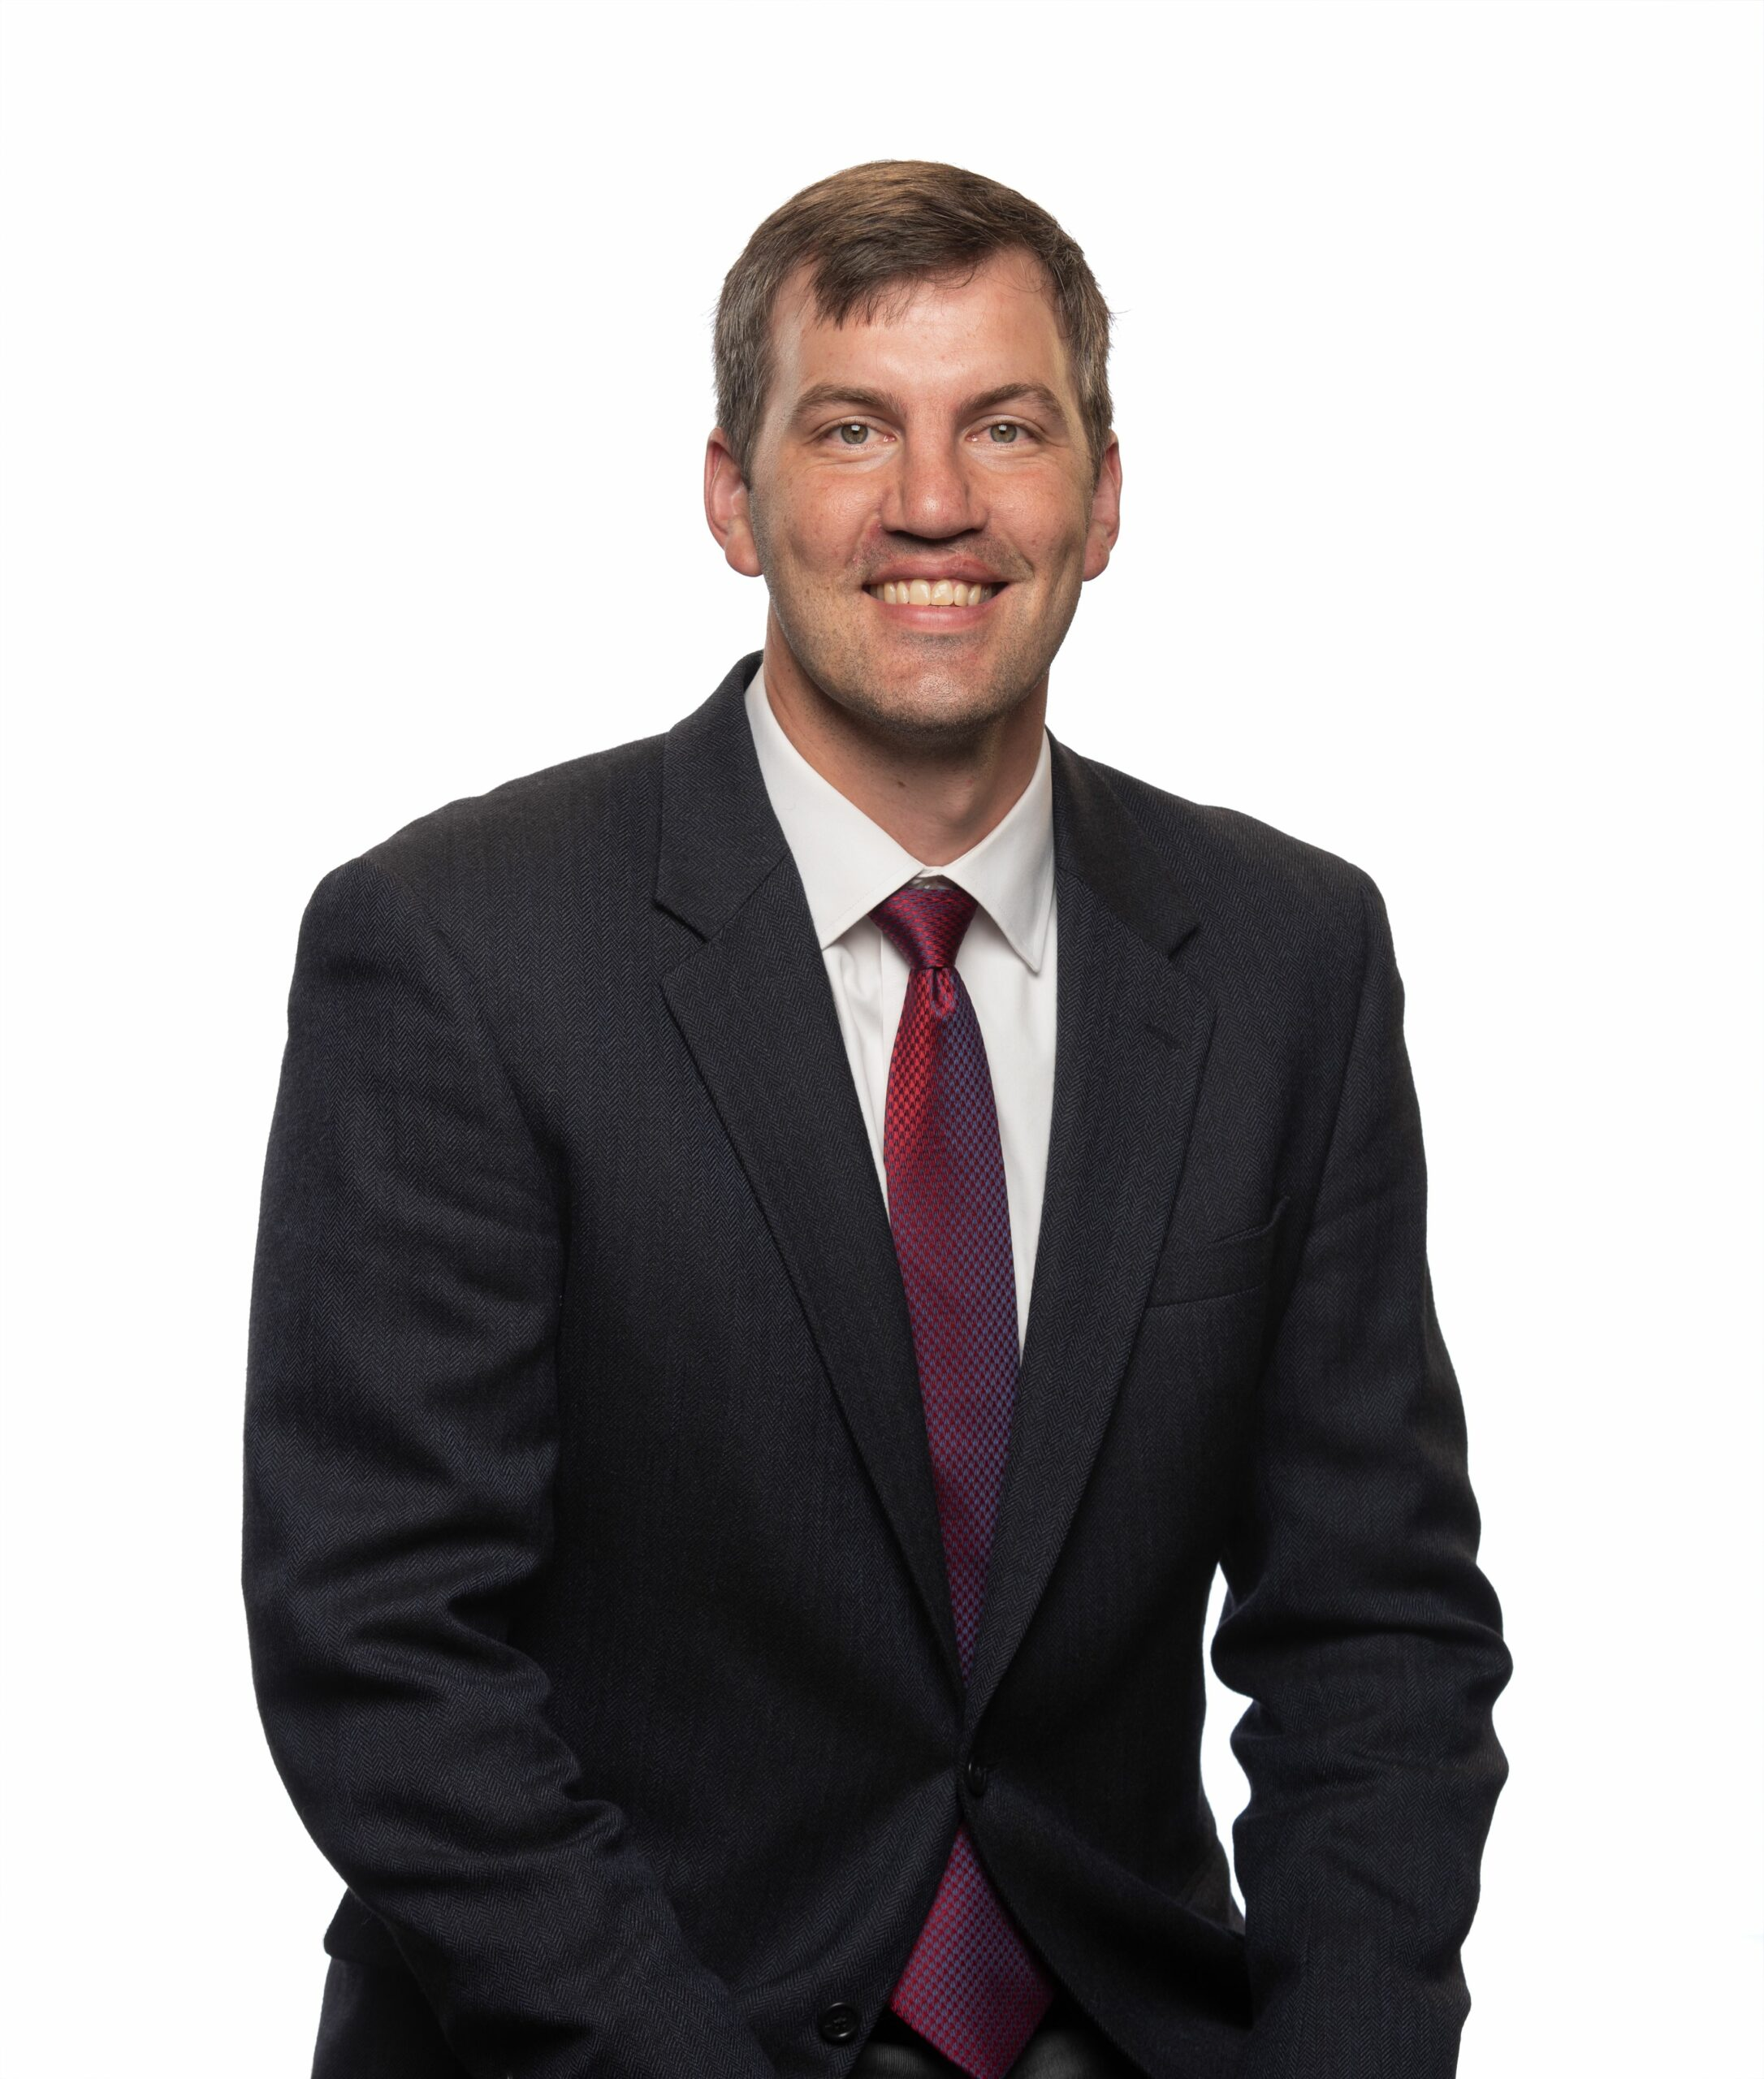 Stephen M. Russell